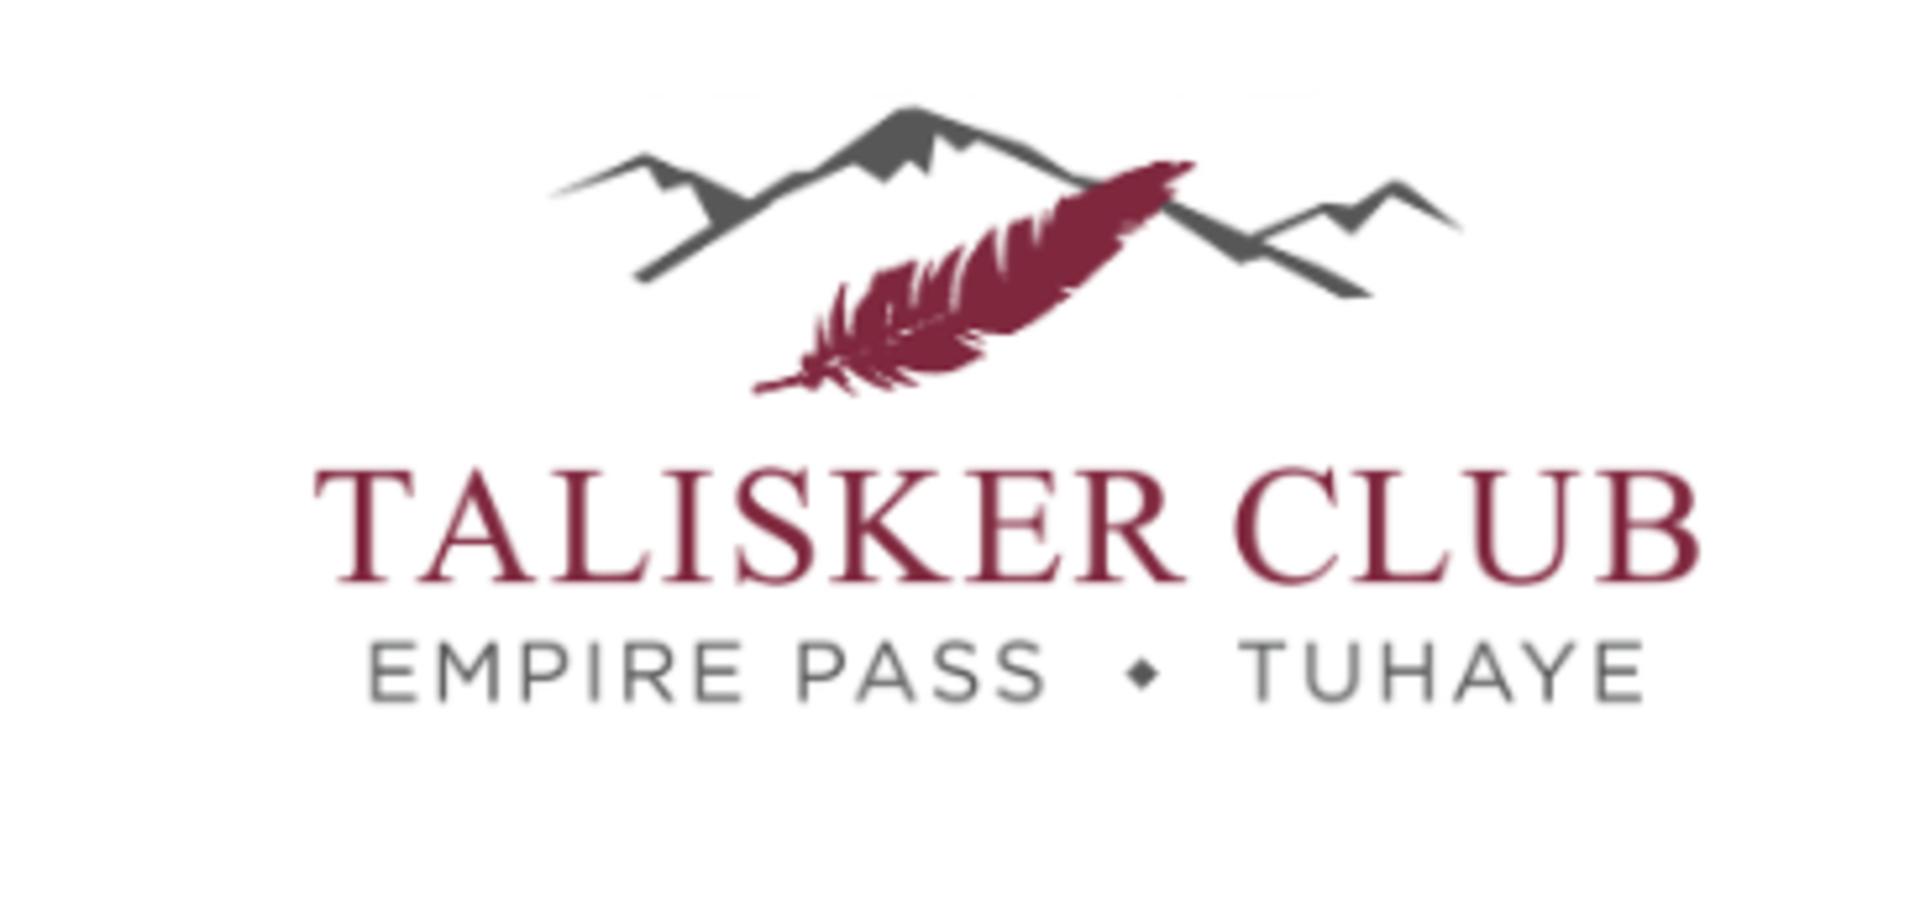 New Talisker Club Venue in Park City